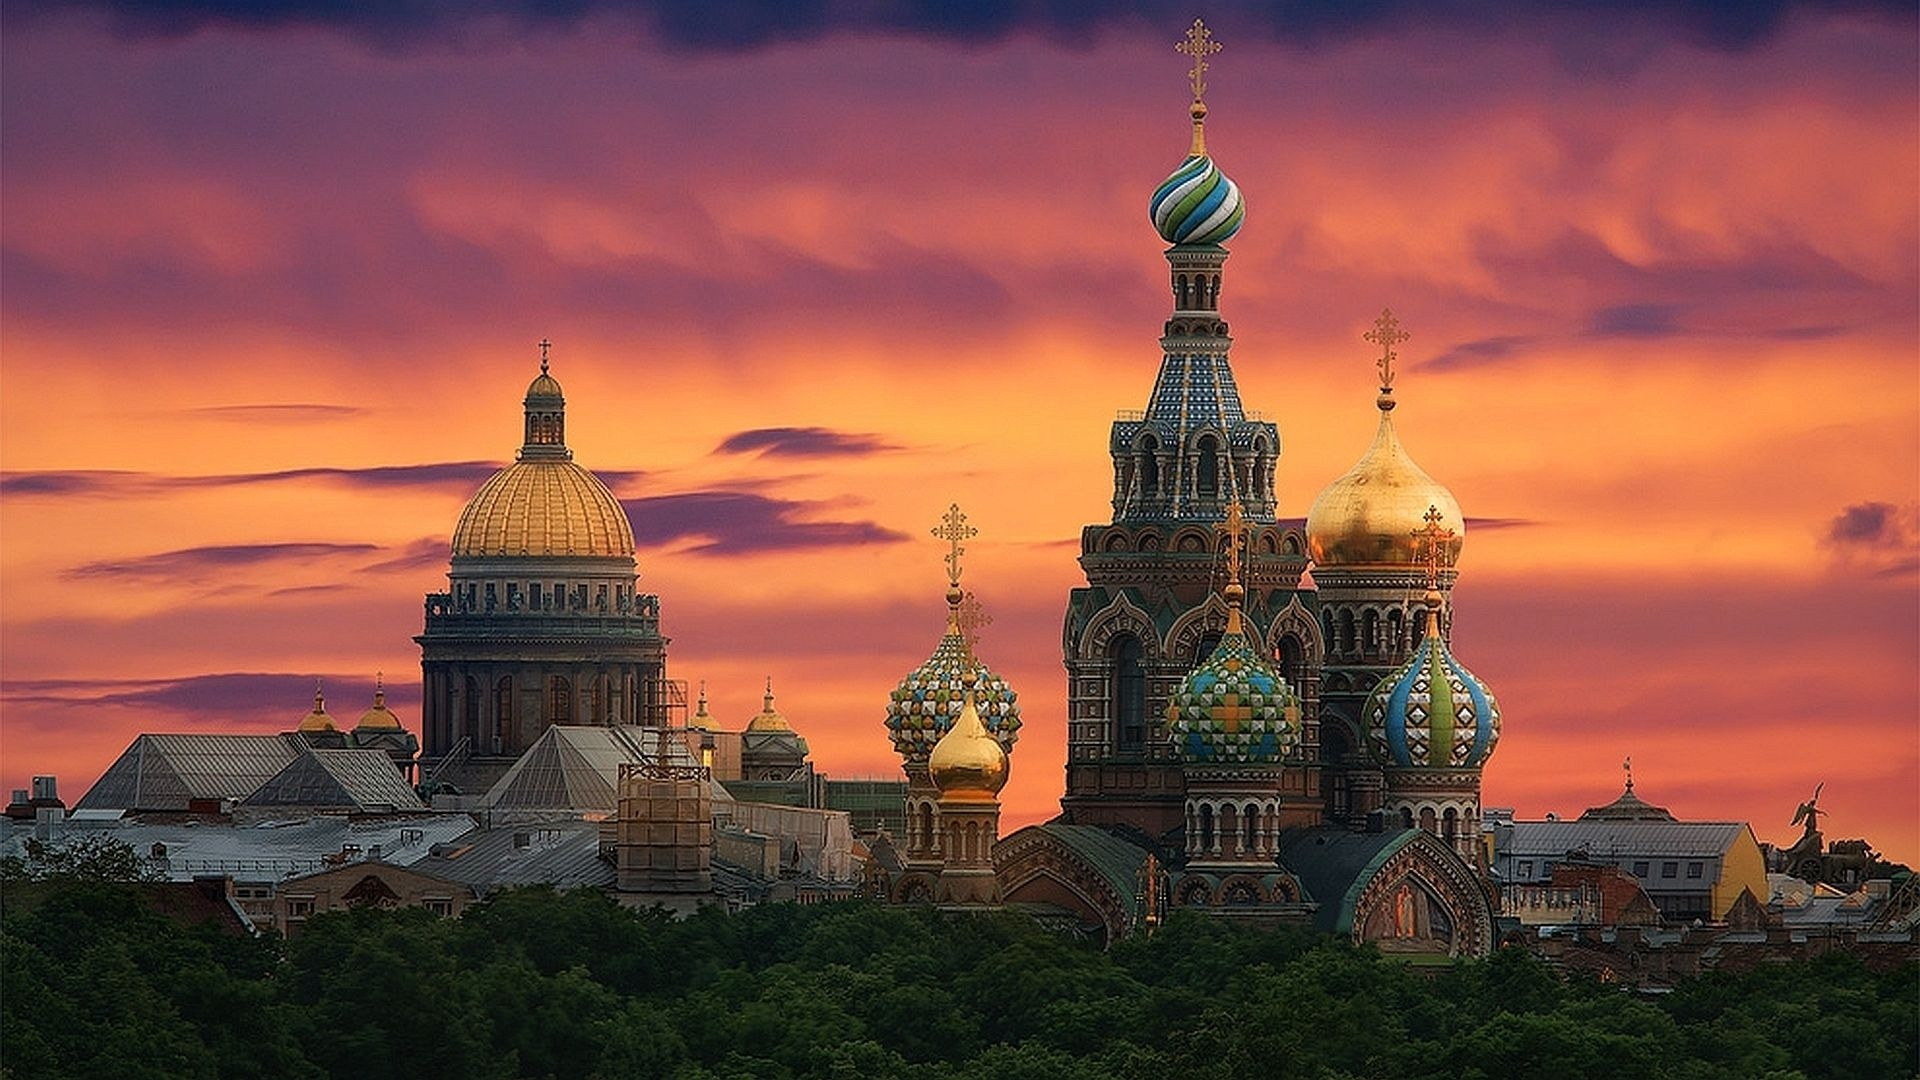 Amazing Saint Petersburg Pictures & Backgrounds